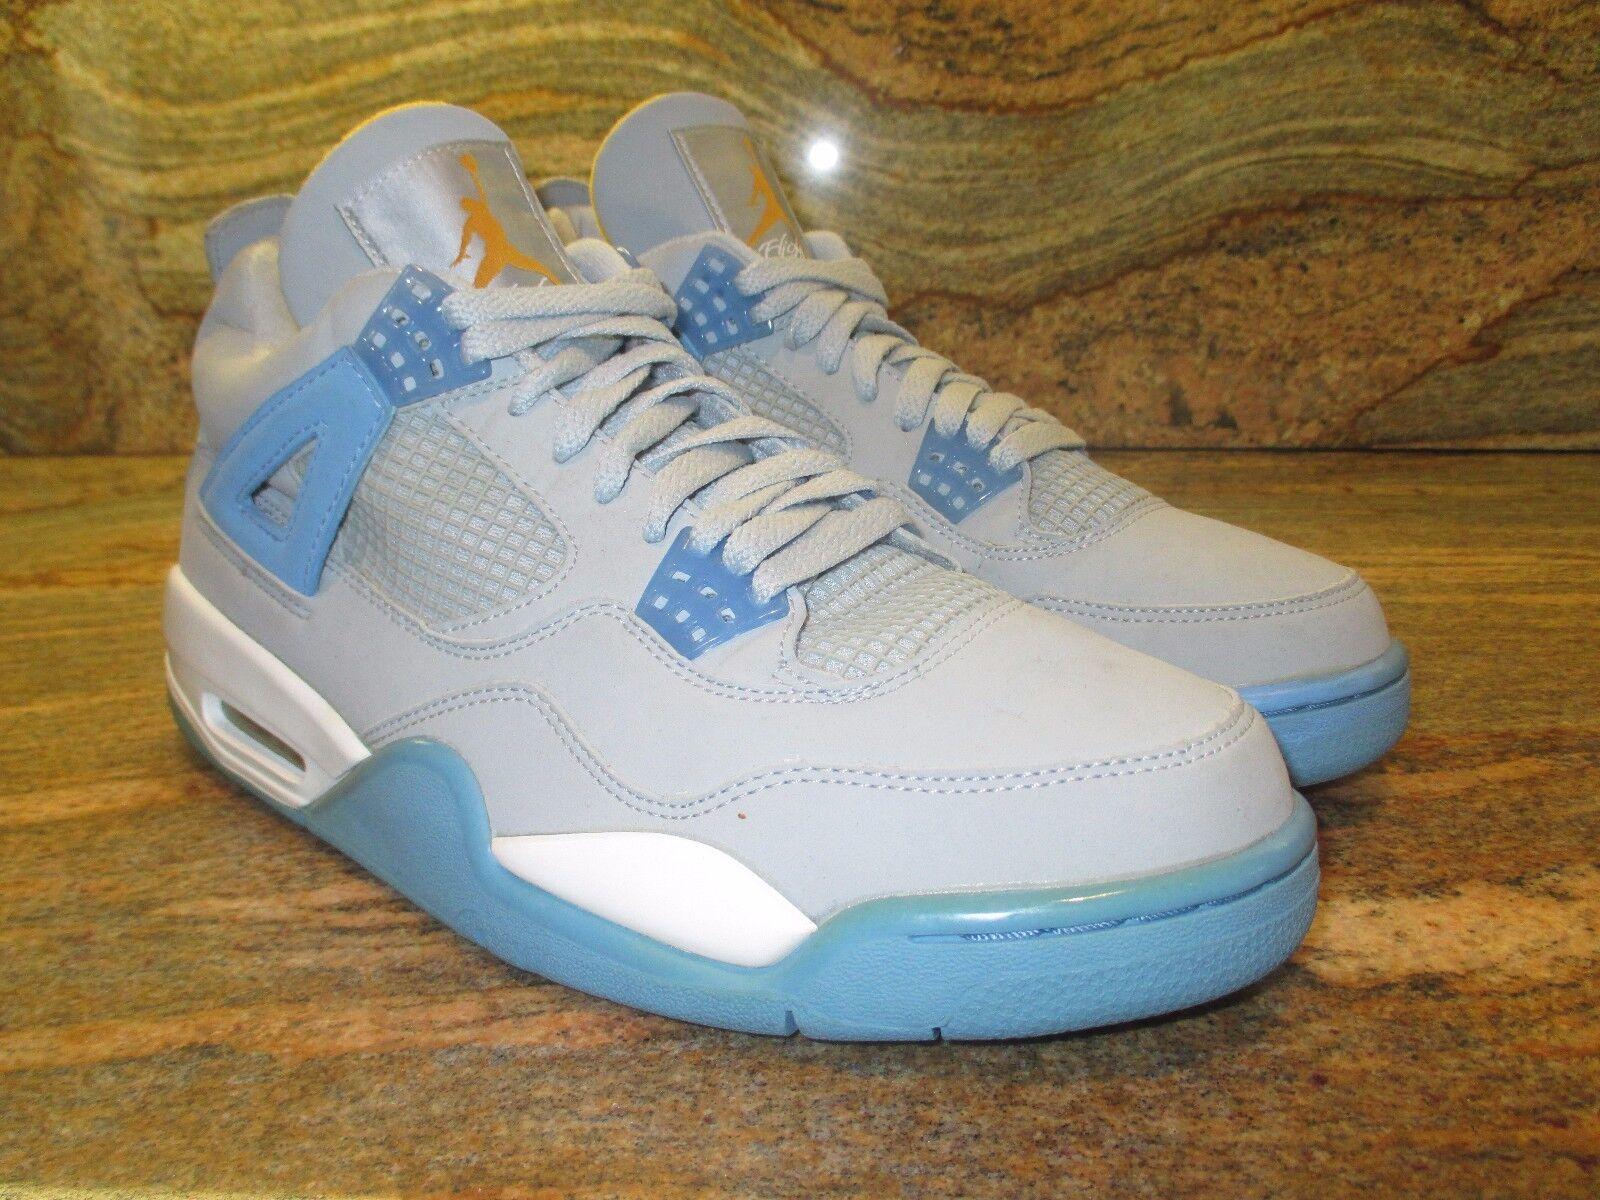 2006 Nike Air Jordan 4 IV Retro LS SZ 10.5 Mist University bluee gold 314254-041